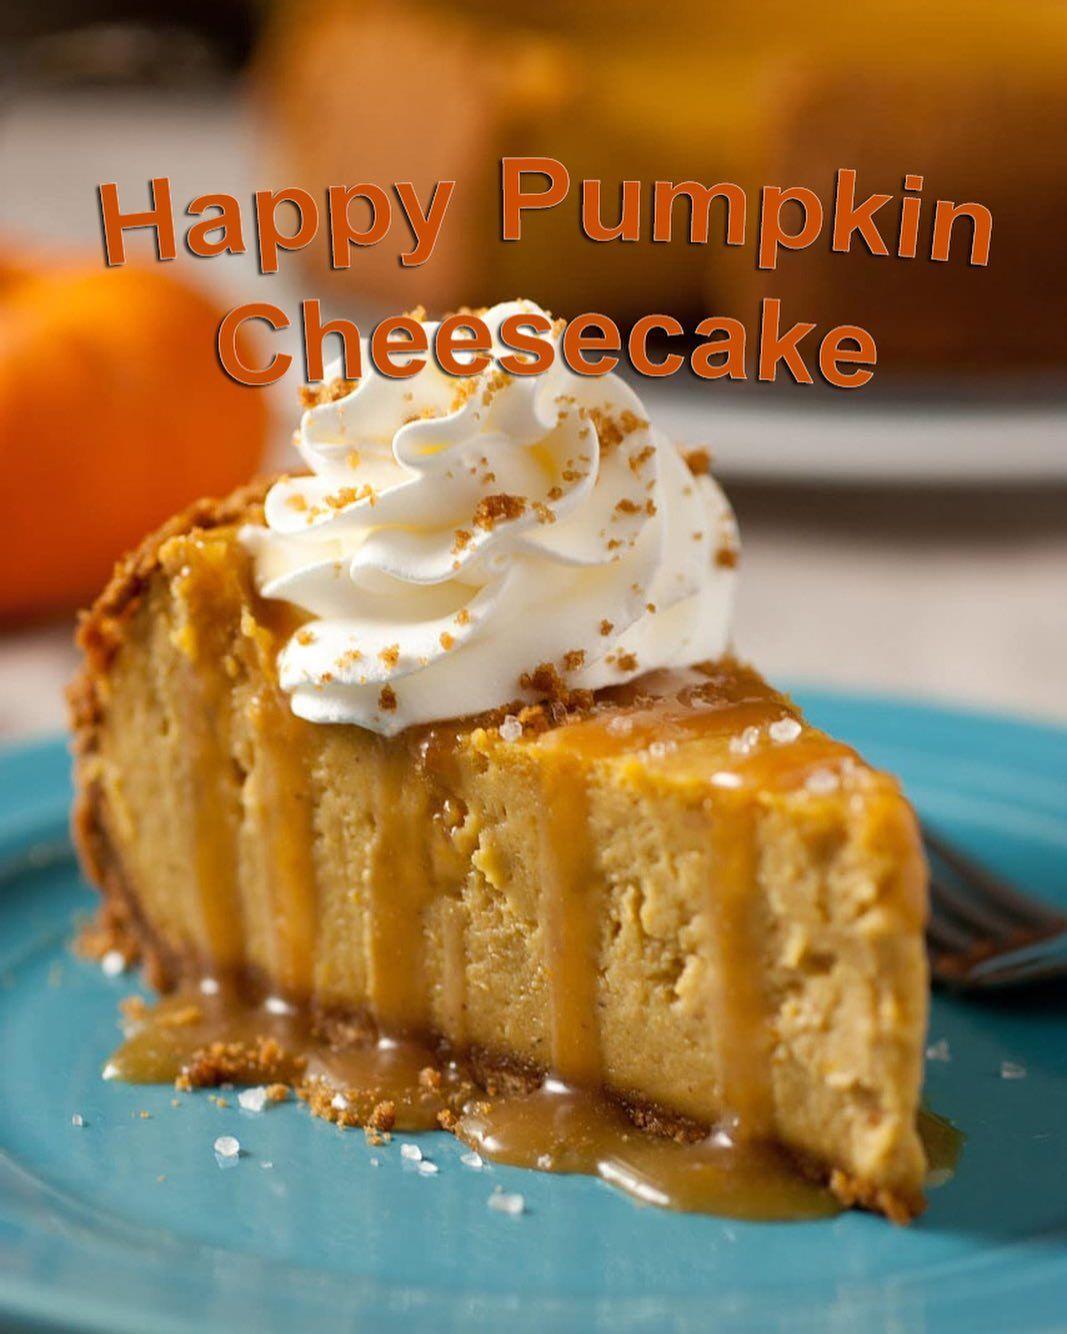 Pumpkin is in season! www.rksshots.com #potd #instalike #igers #pumpkin #pumpkincheesecake